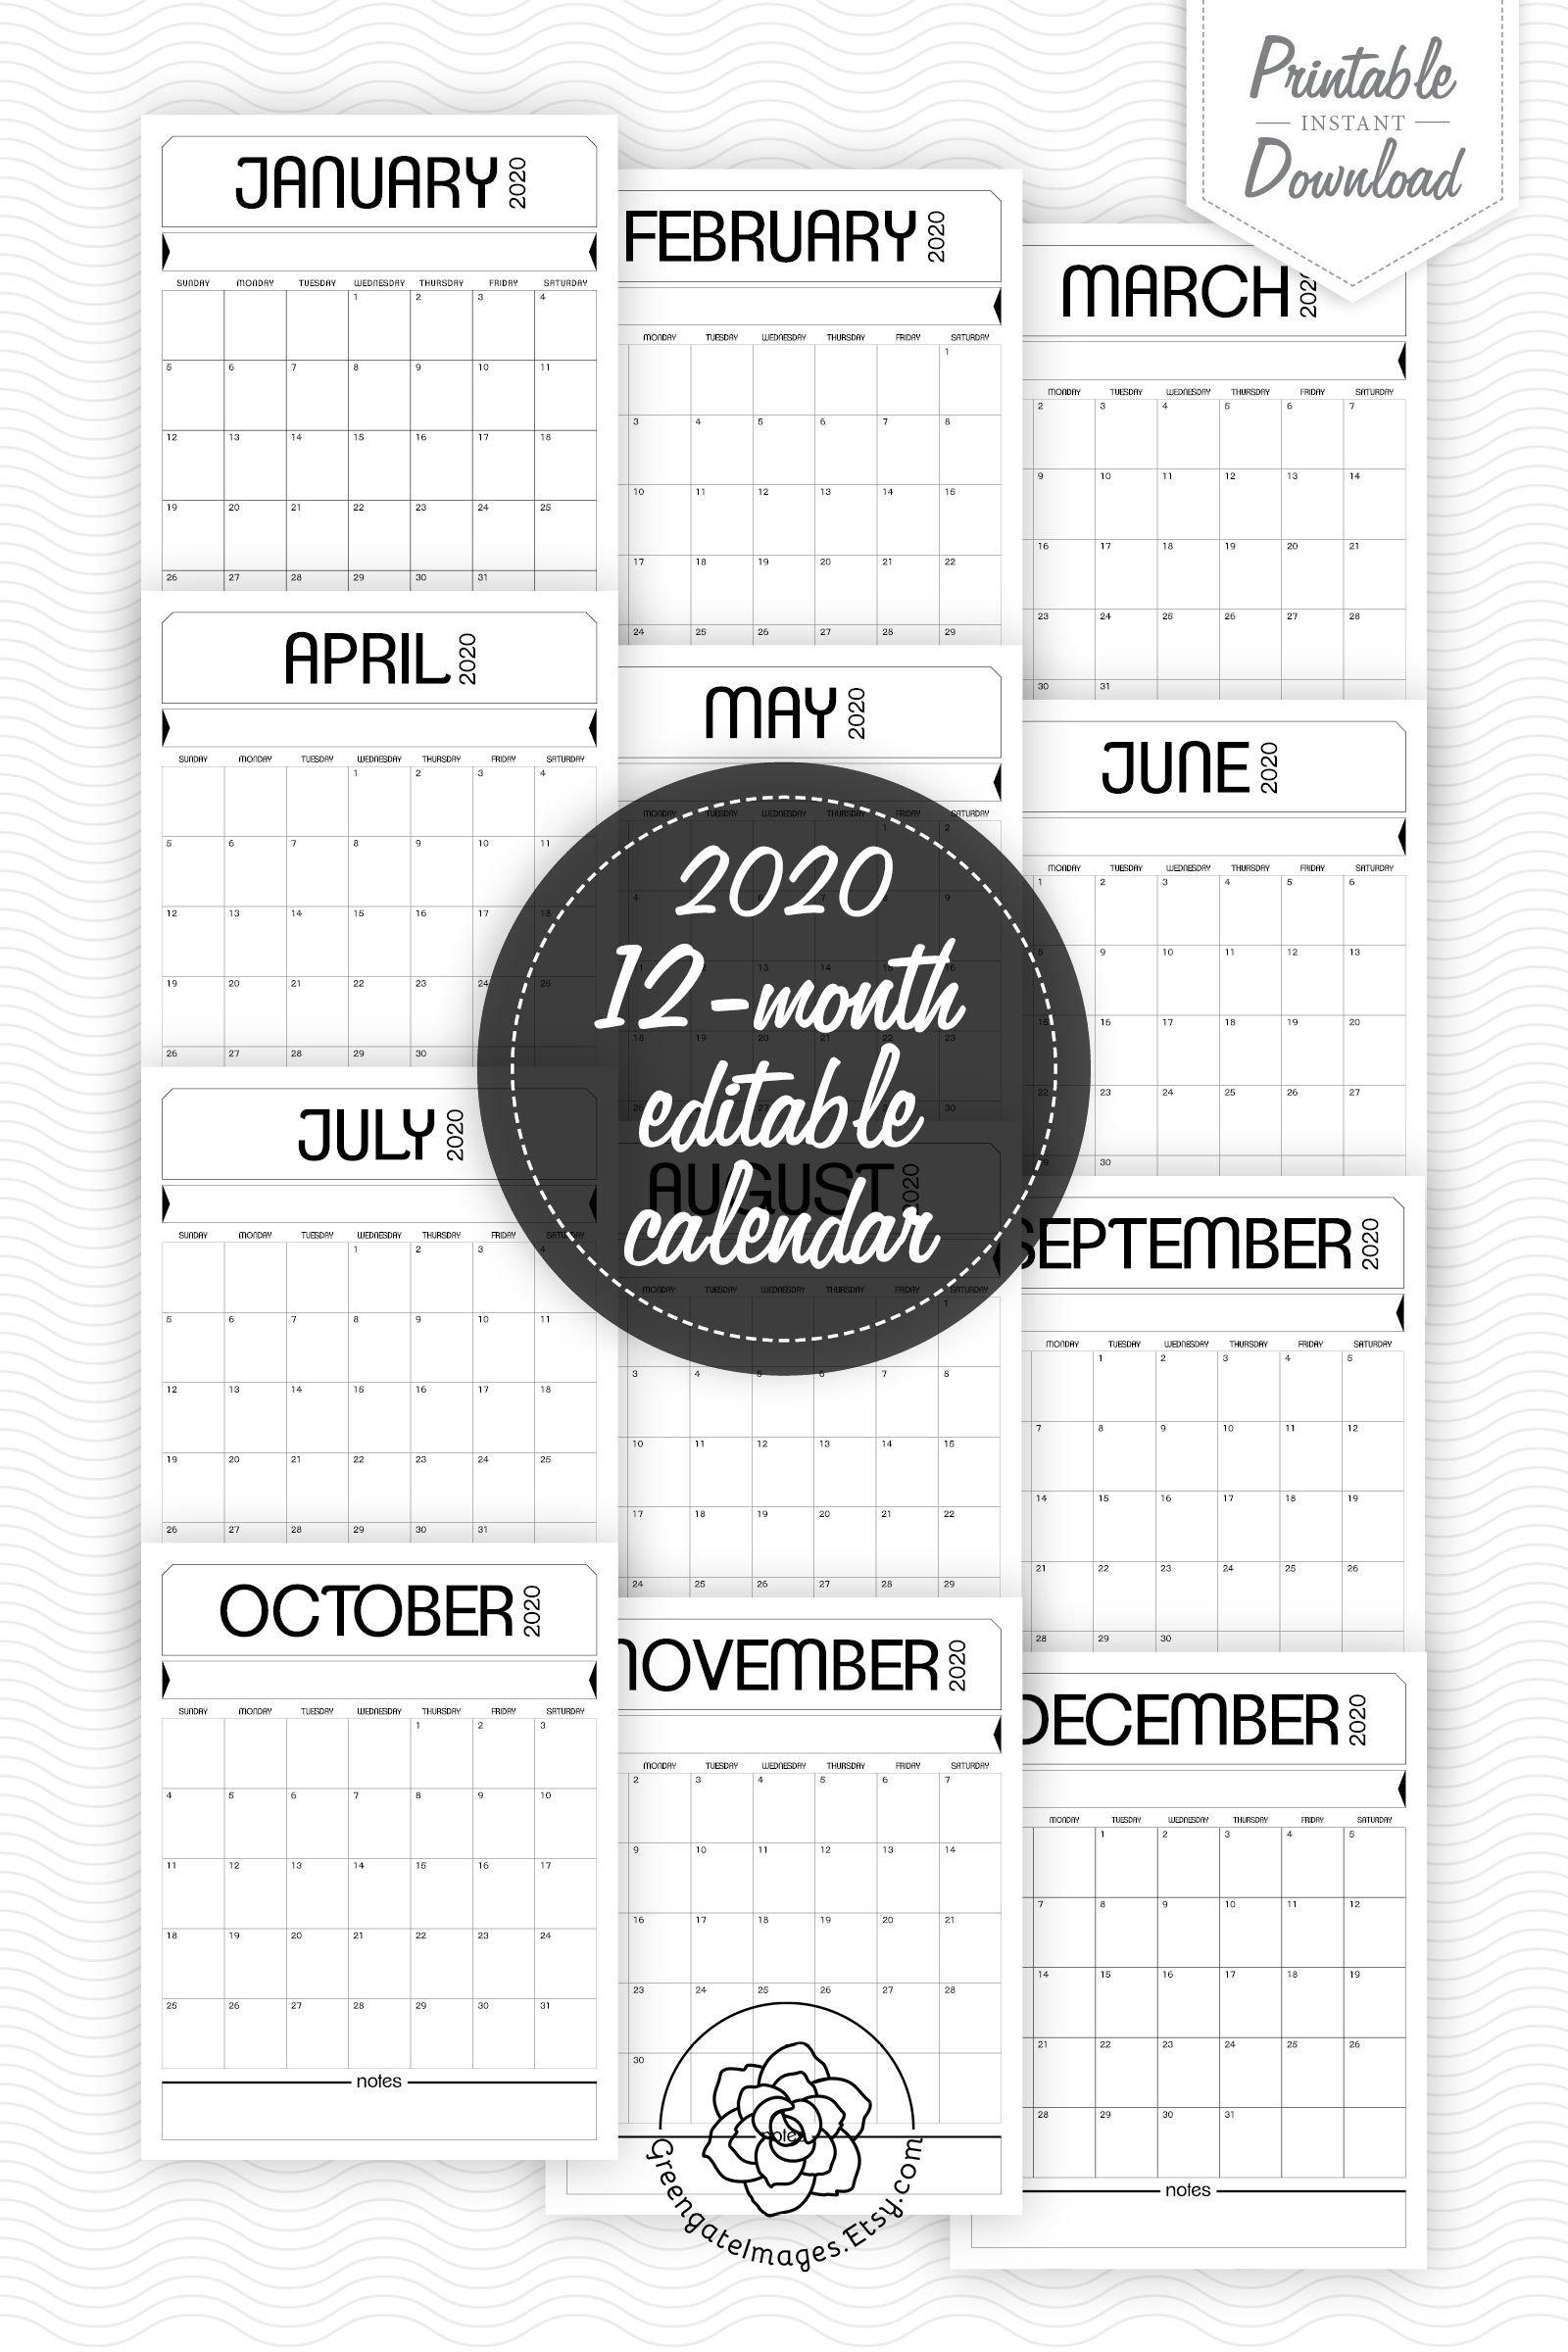 2020 Printable Calendar - Fillable Planner, Editable Pdf Fillable Birthday Calendar Template